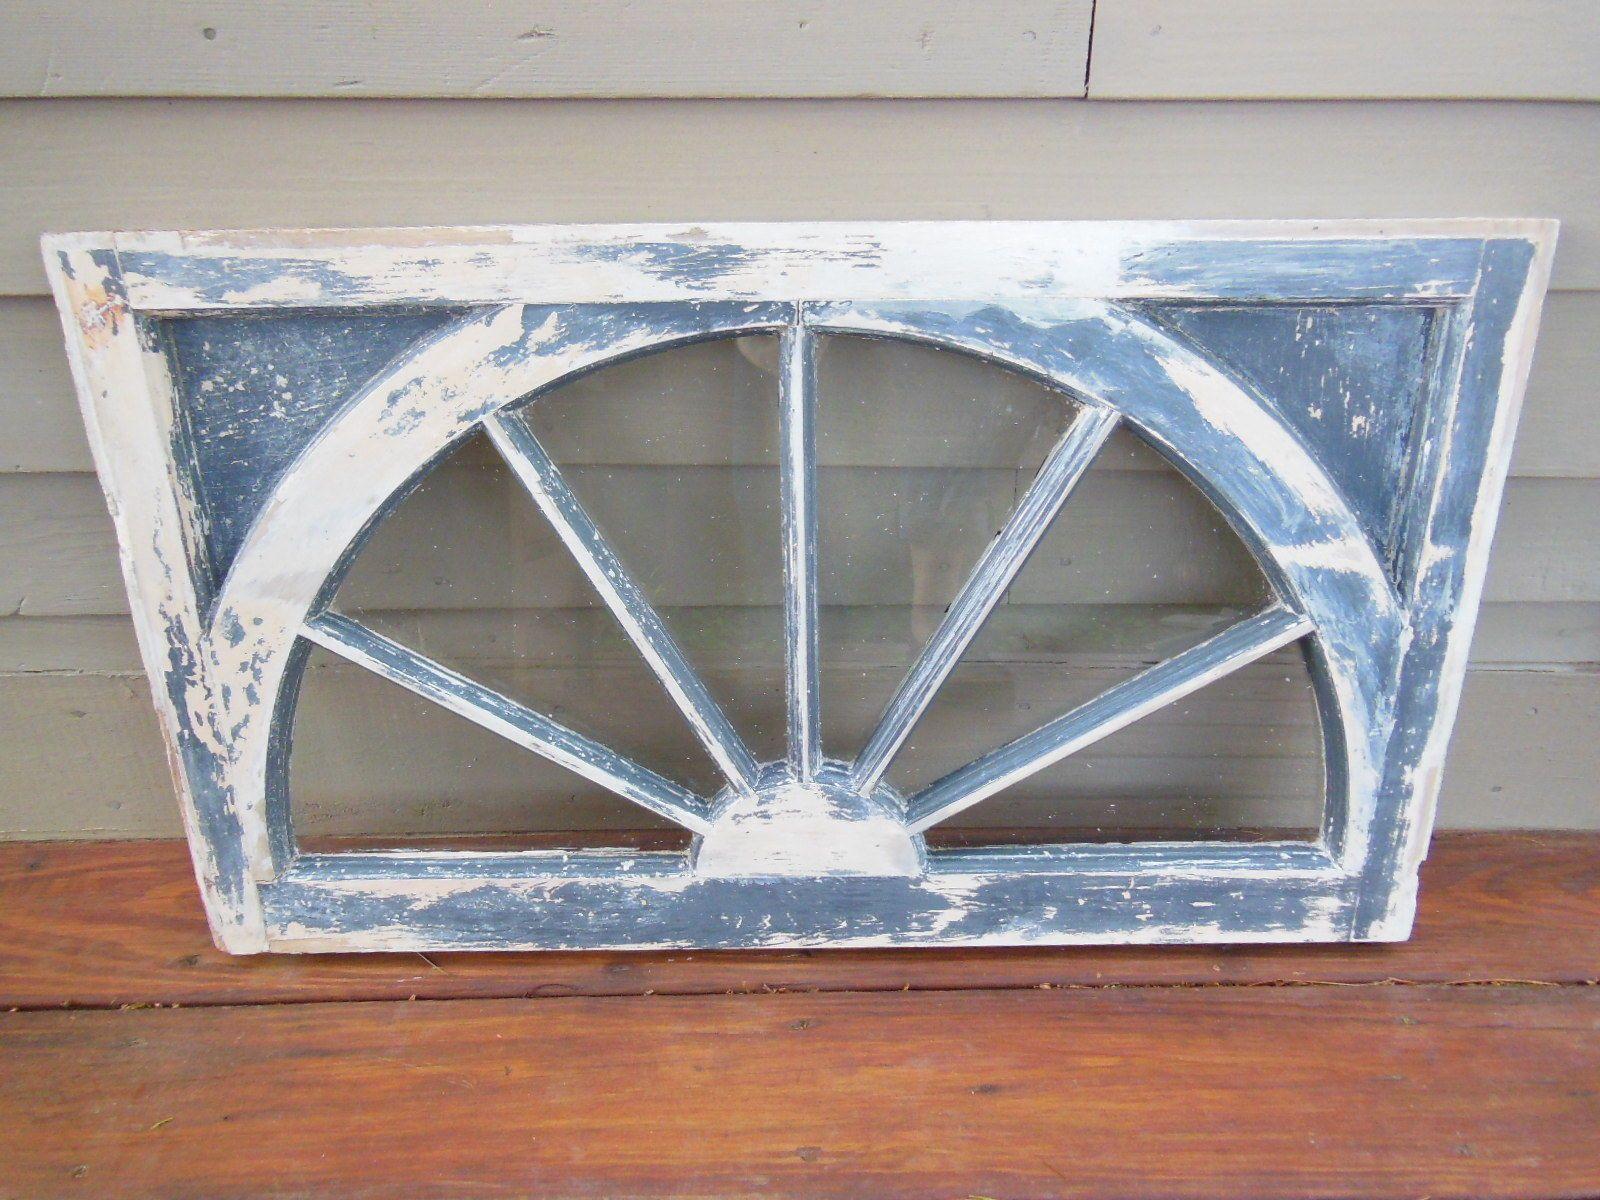 Antique Wooden Half Round Transom Window Shabby Architectural